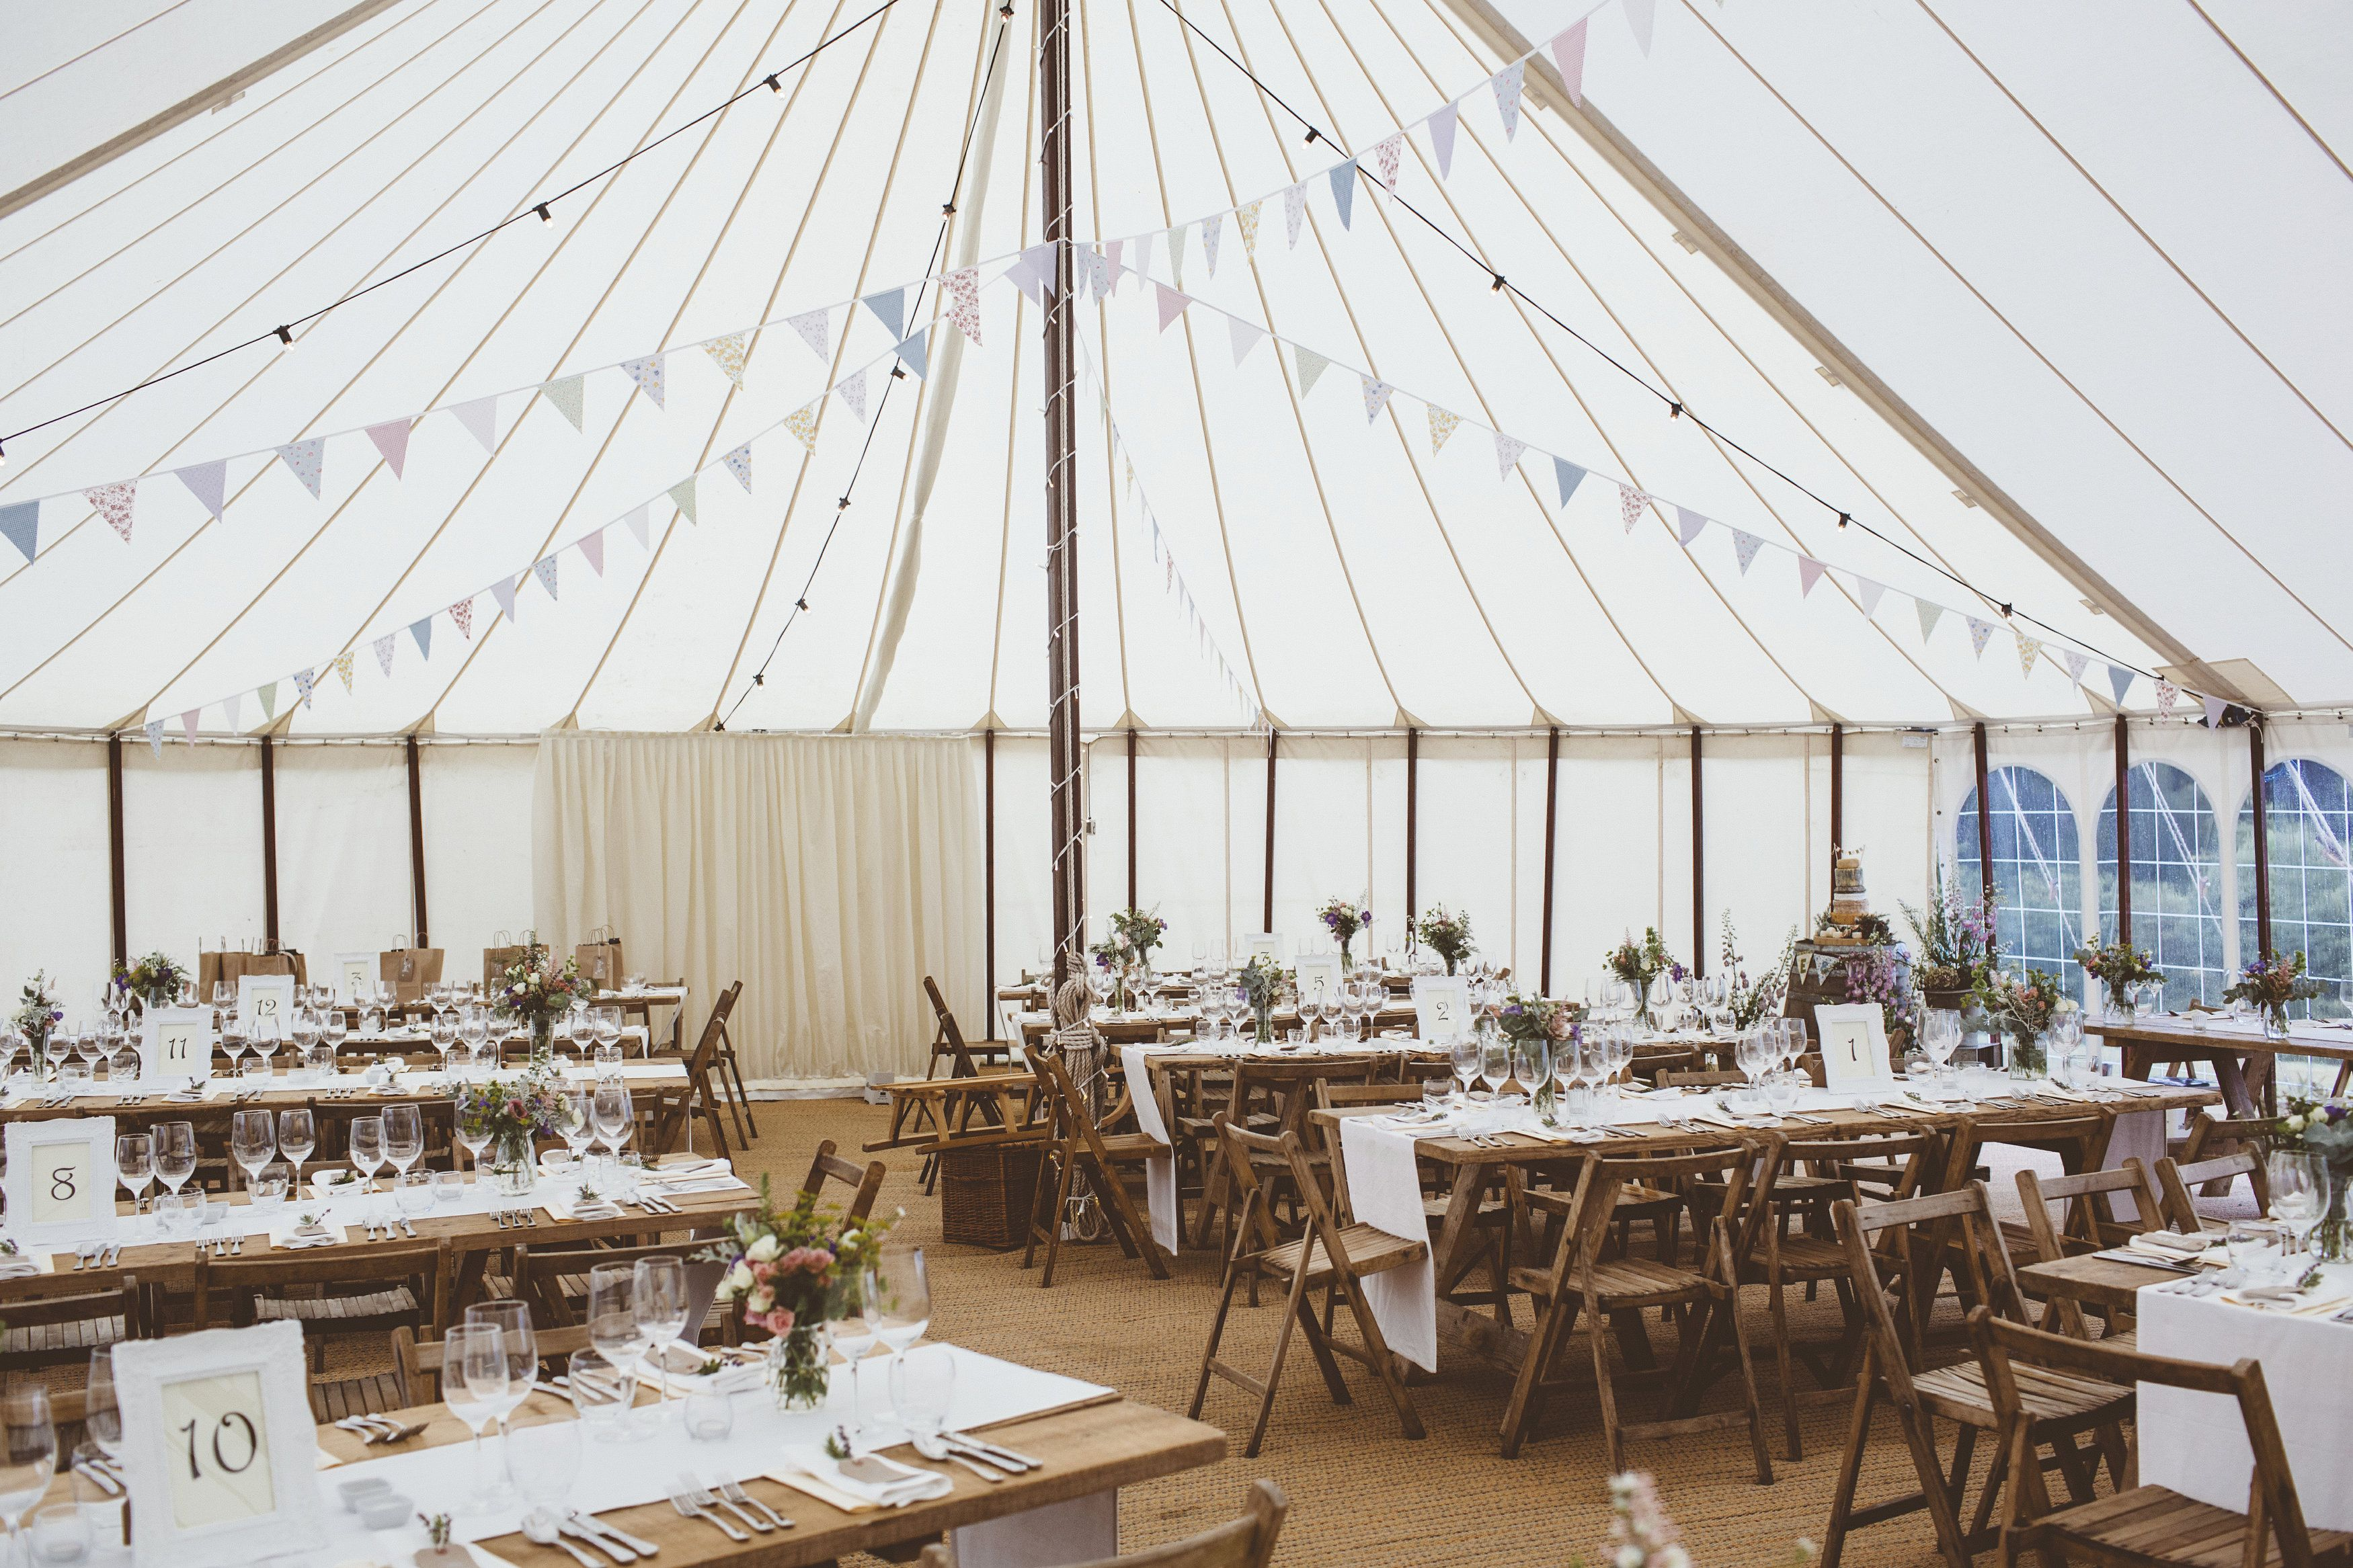 Surrey Countryside Garden Marquee Wedding Setup Wooden Rectangular Tables Rustic Style White Table Runners And Wedding Set Up Garden Marquee Marquee Wedding